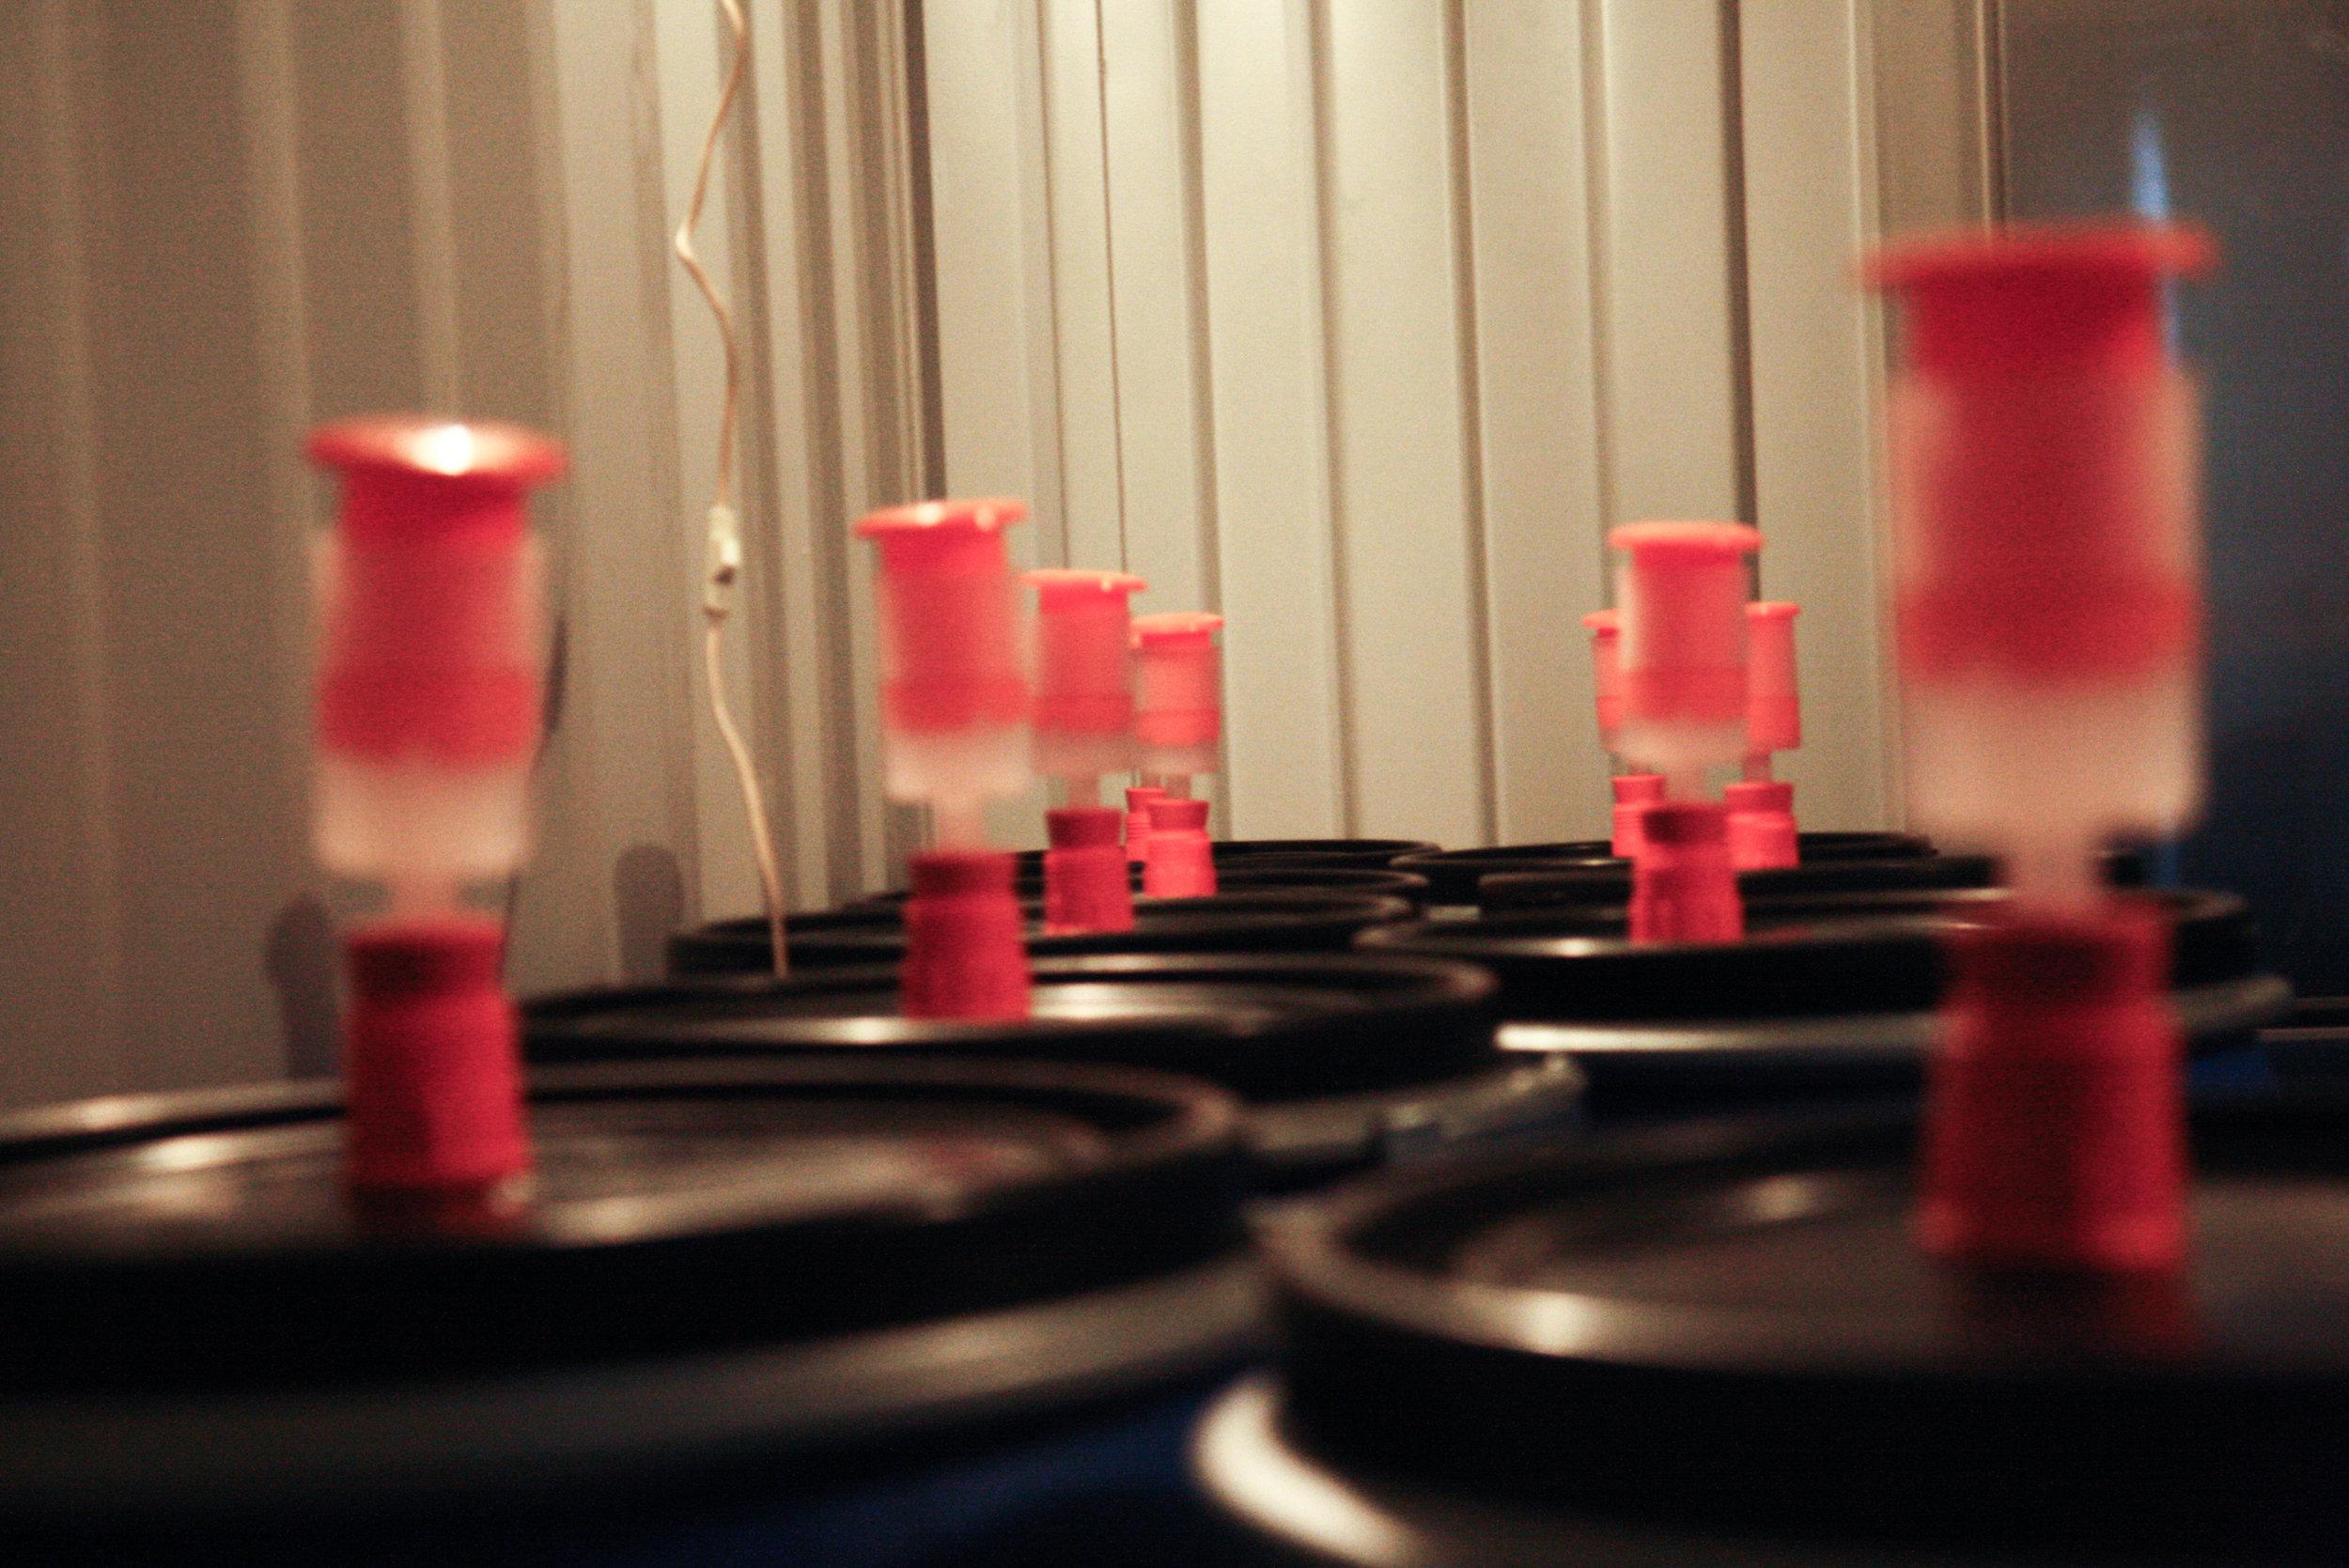 8 - Malolactic fermentation